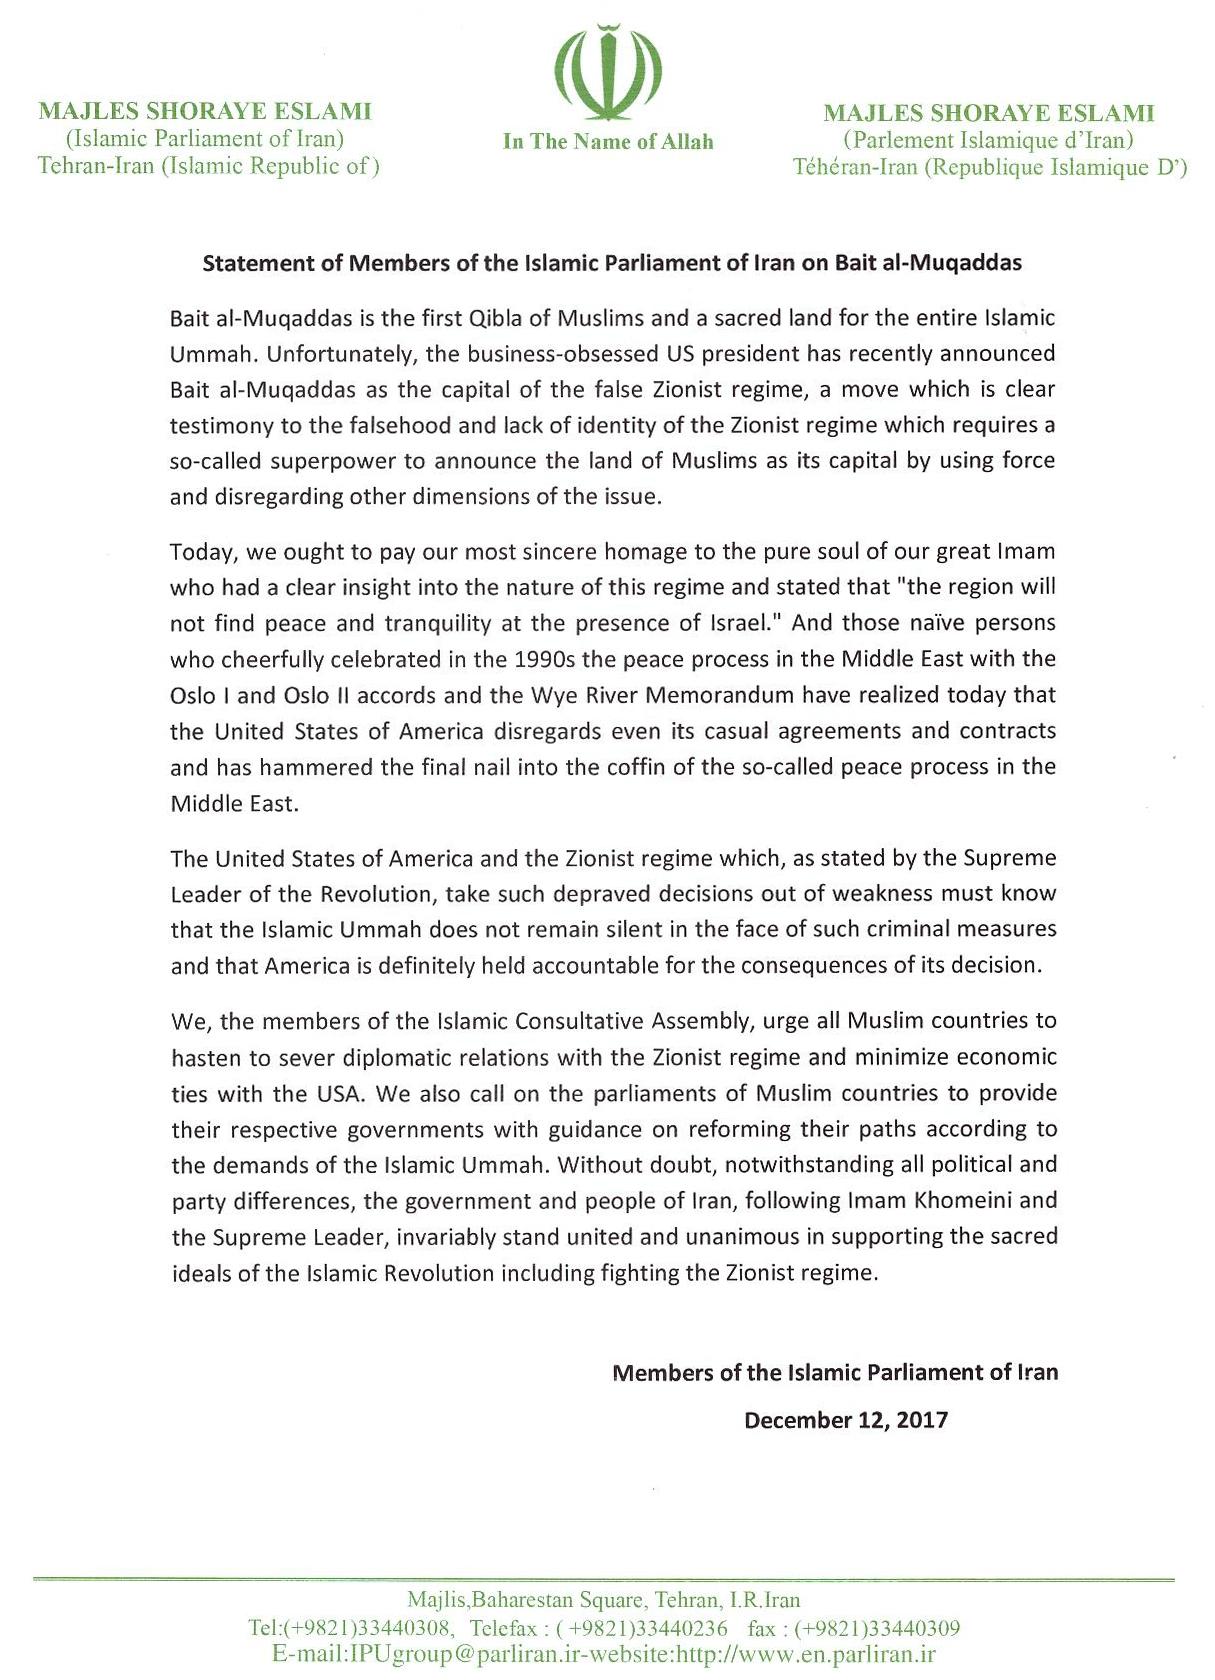 Members of the Islamic Parliament of Iran Issue Statement on Bait al-Muqaddas